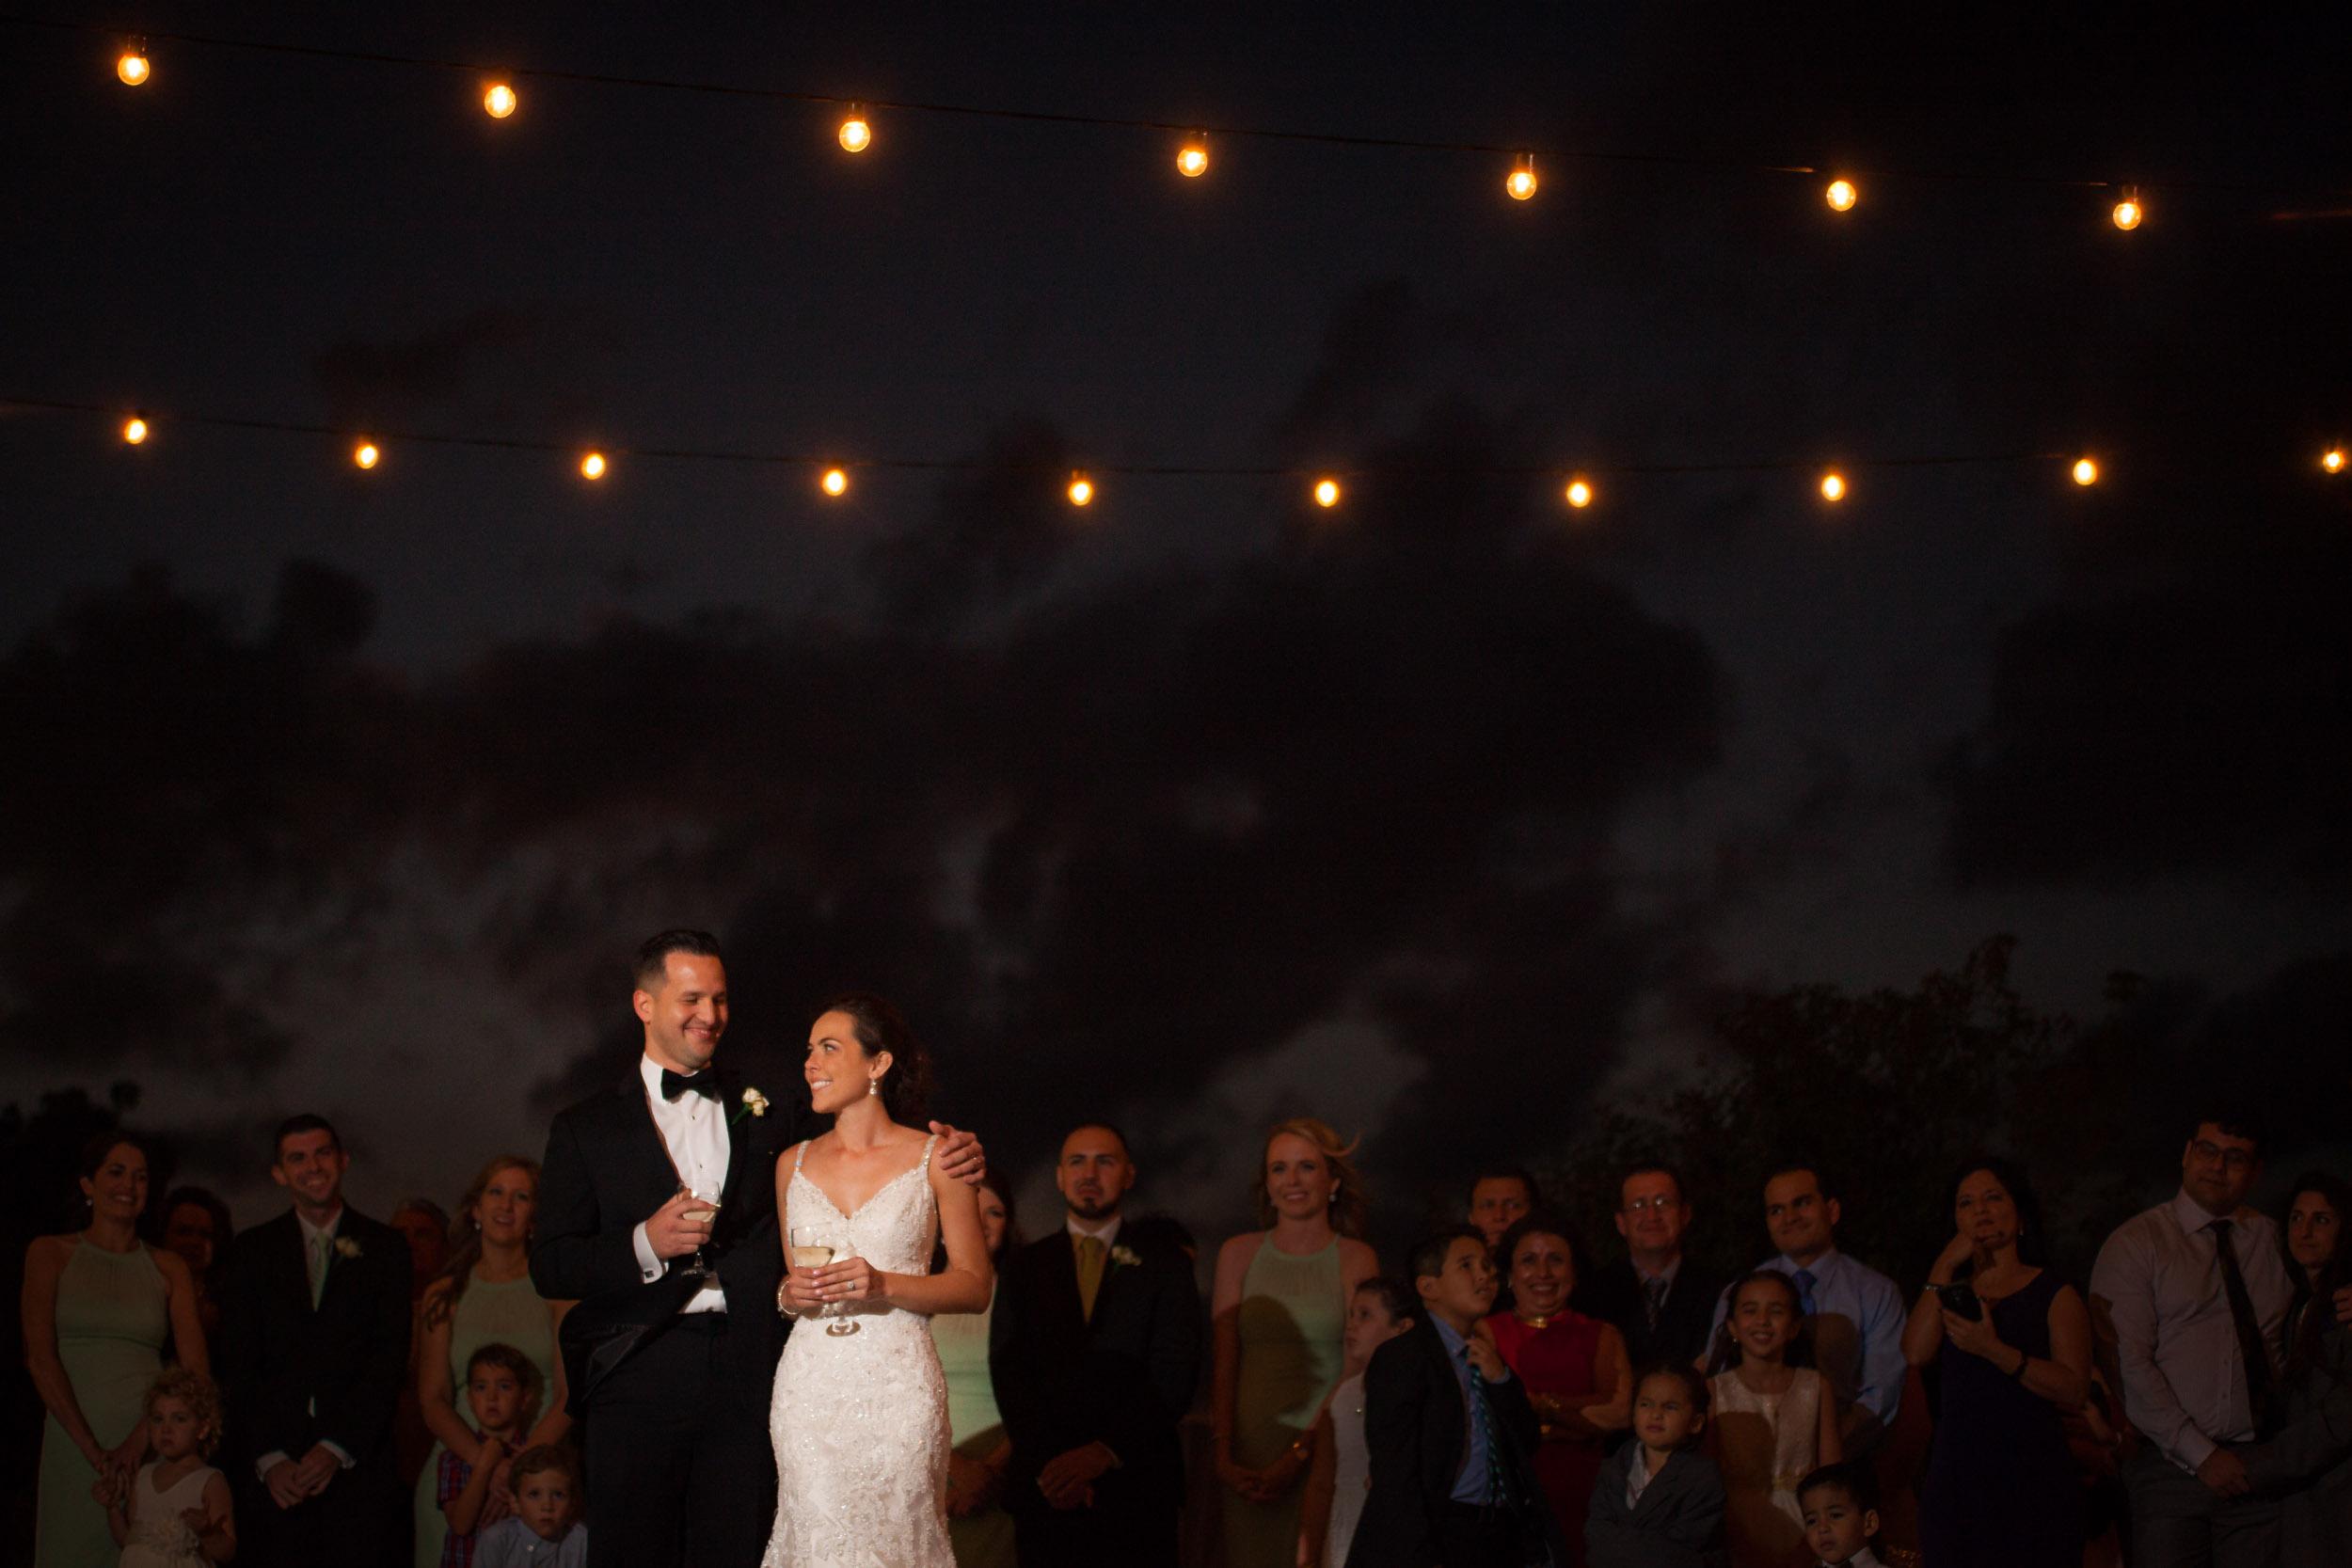 Flordia-Wedding-Photography-65.jpg